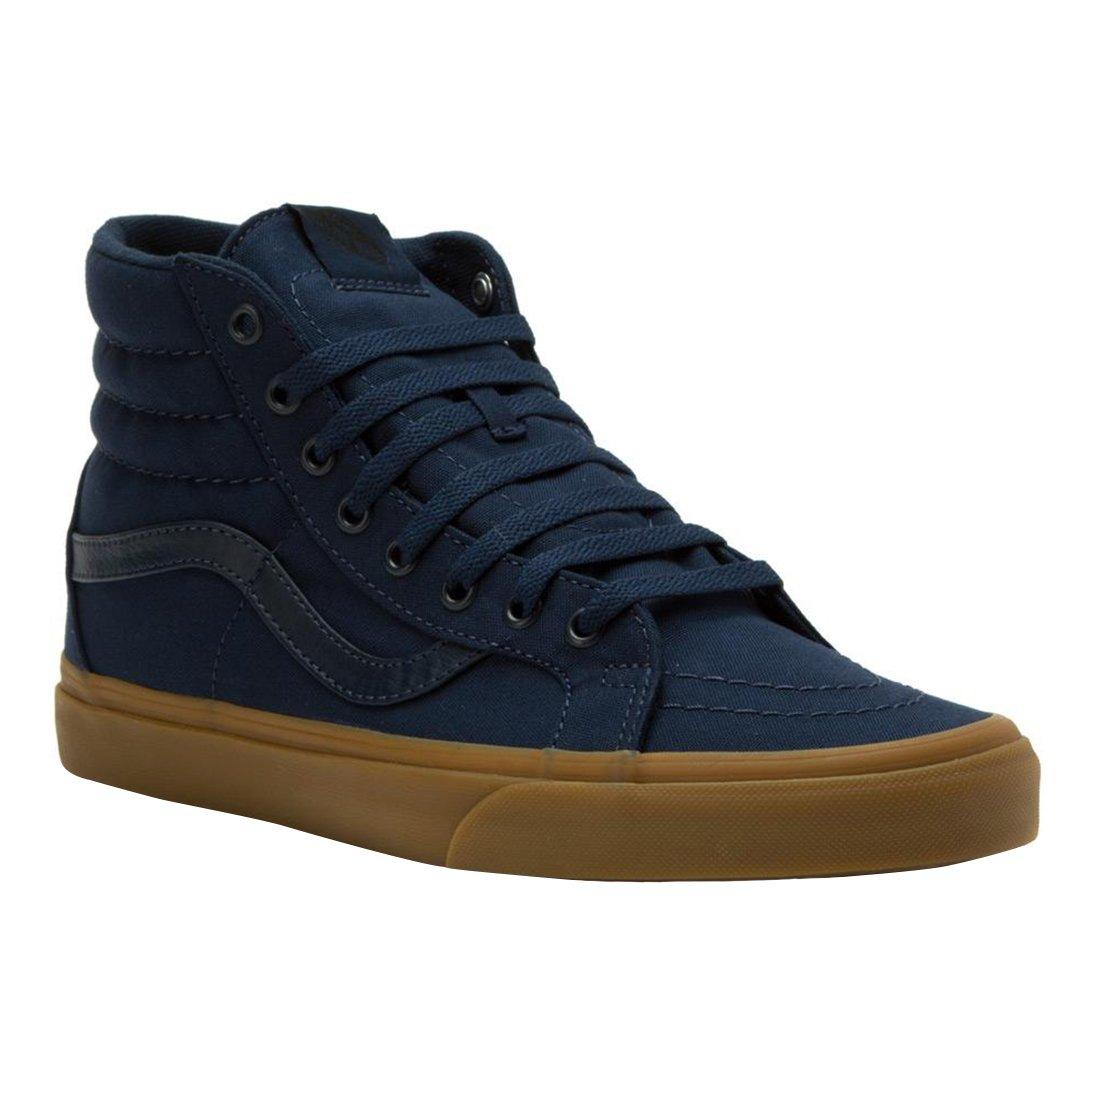 Galleon - Vans Mens SK8-Hi Reissue Sneaker Dress Blues Light Gum Size 10 d9061a4b4